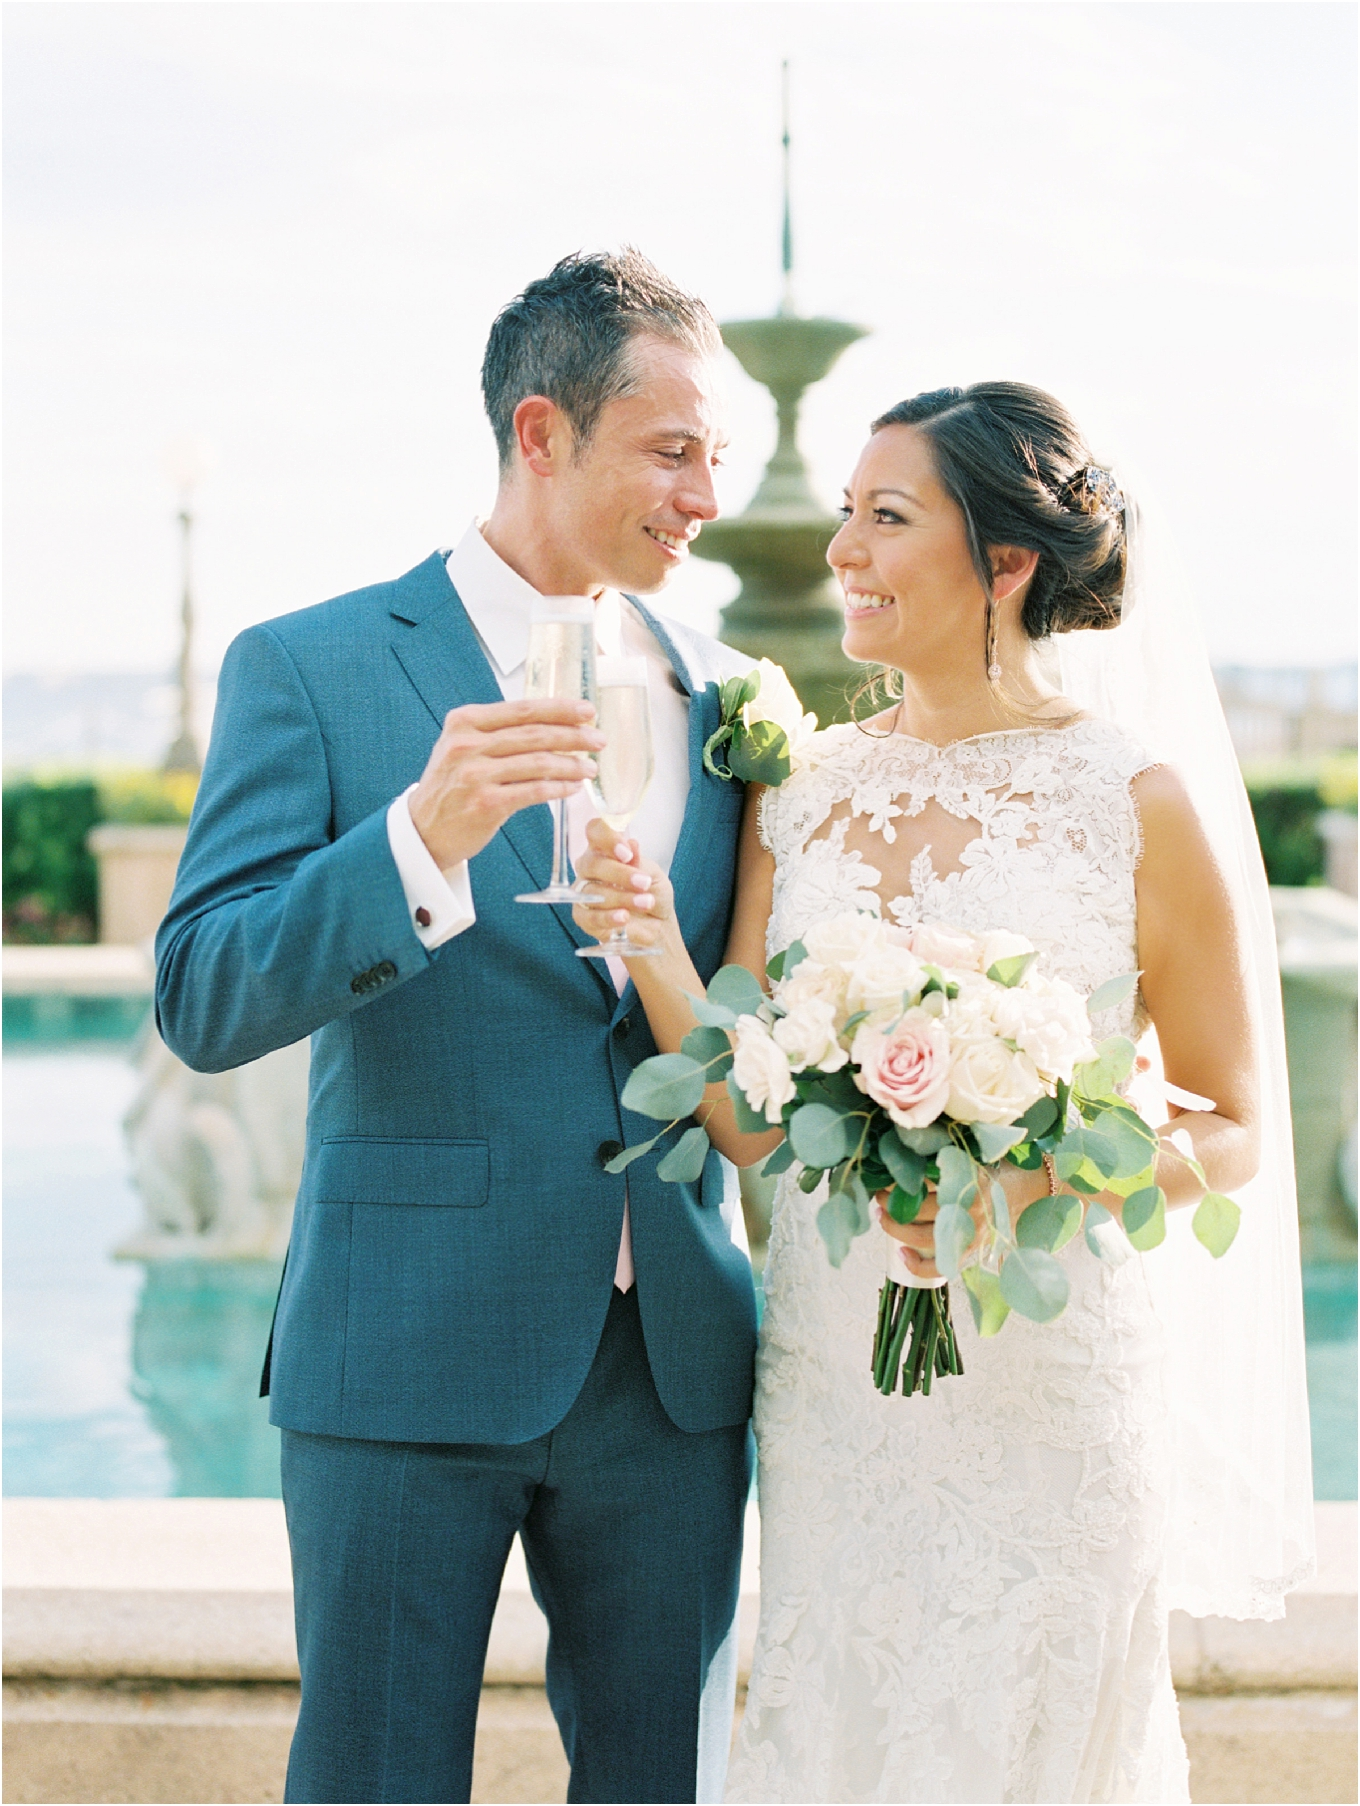 Lisa Silva Photography- Ponte Vedra Beach, St. Augustine and Jacksonville, Florida Fine Art Film Wedding and Boudoir Photography- Elegant Blush  Wedding at Epping Forest Yacht Club in Jacksonville, Florida_0063.jpg